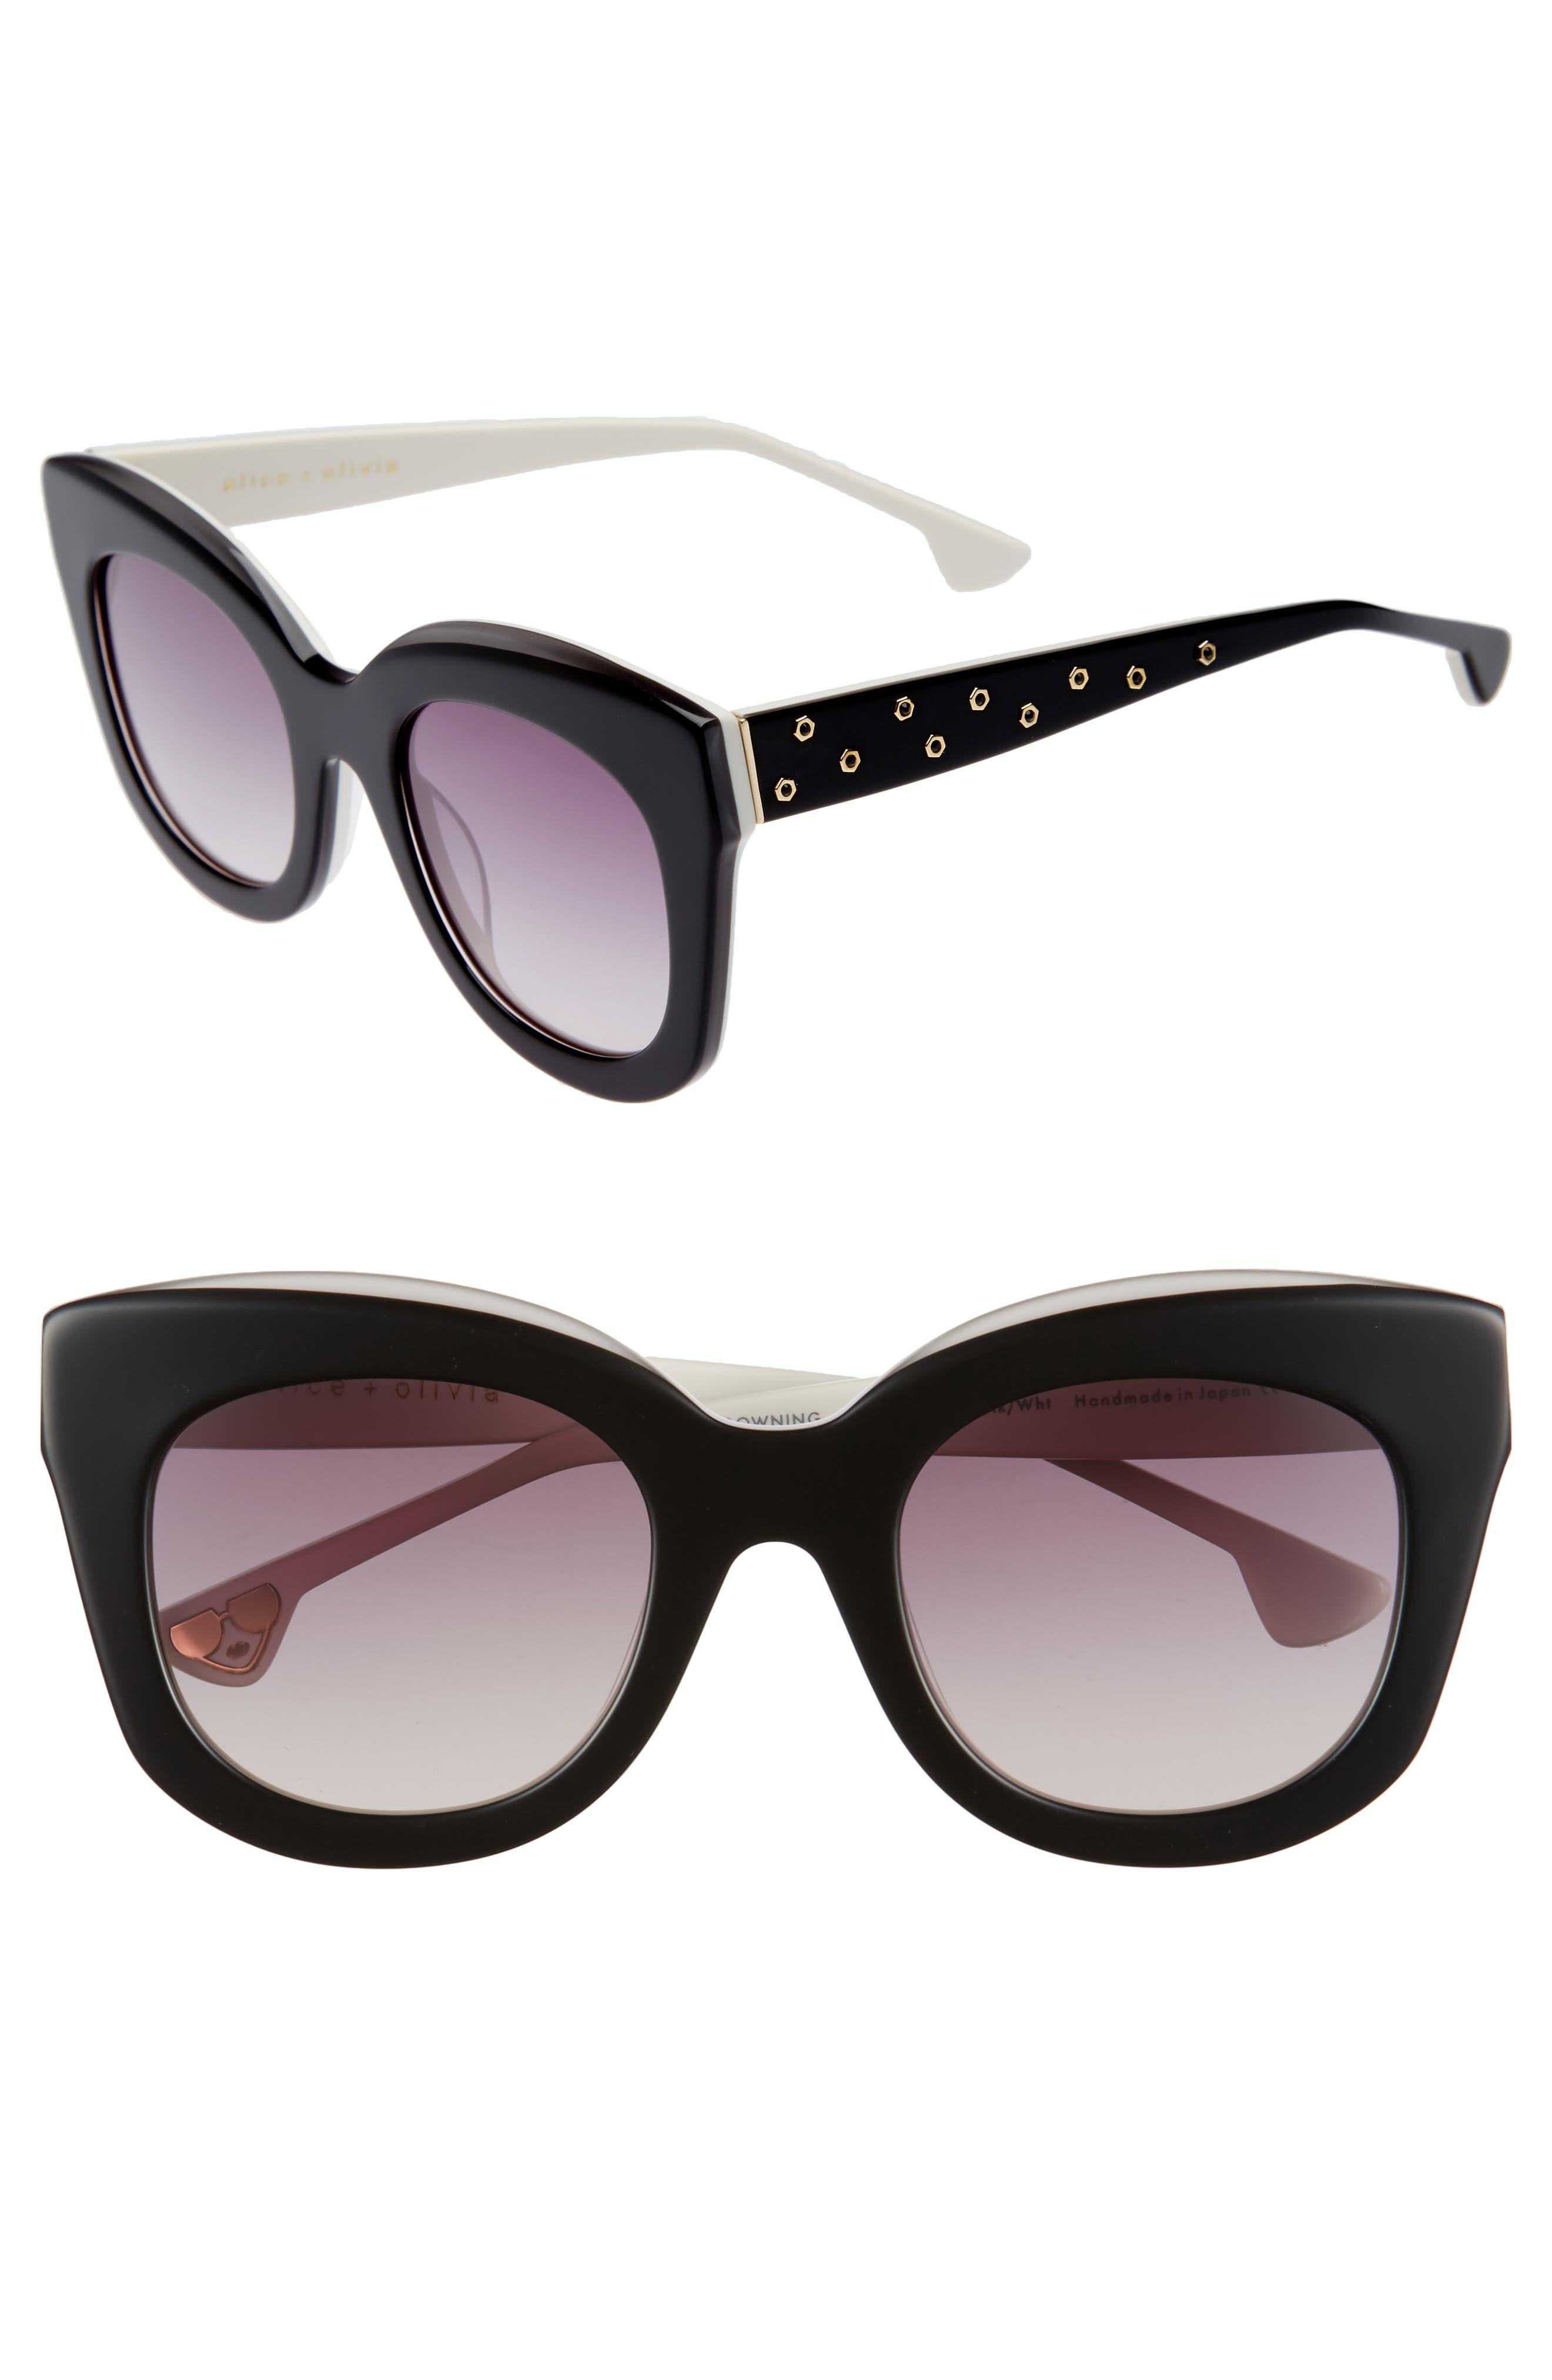 Downing 51mm Cat Eye Sunglasses,                             Main thumbnail 1, color,                             001